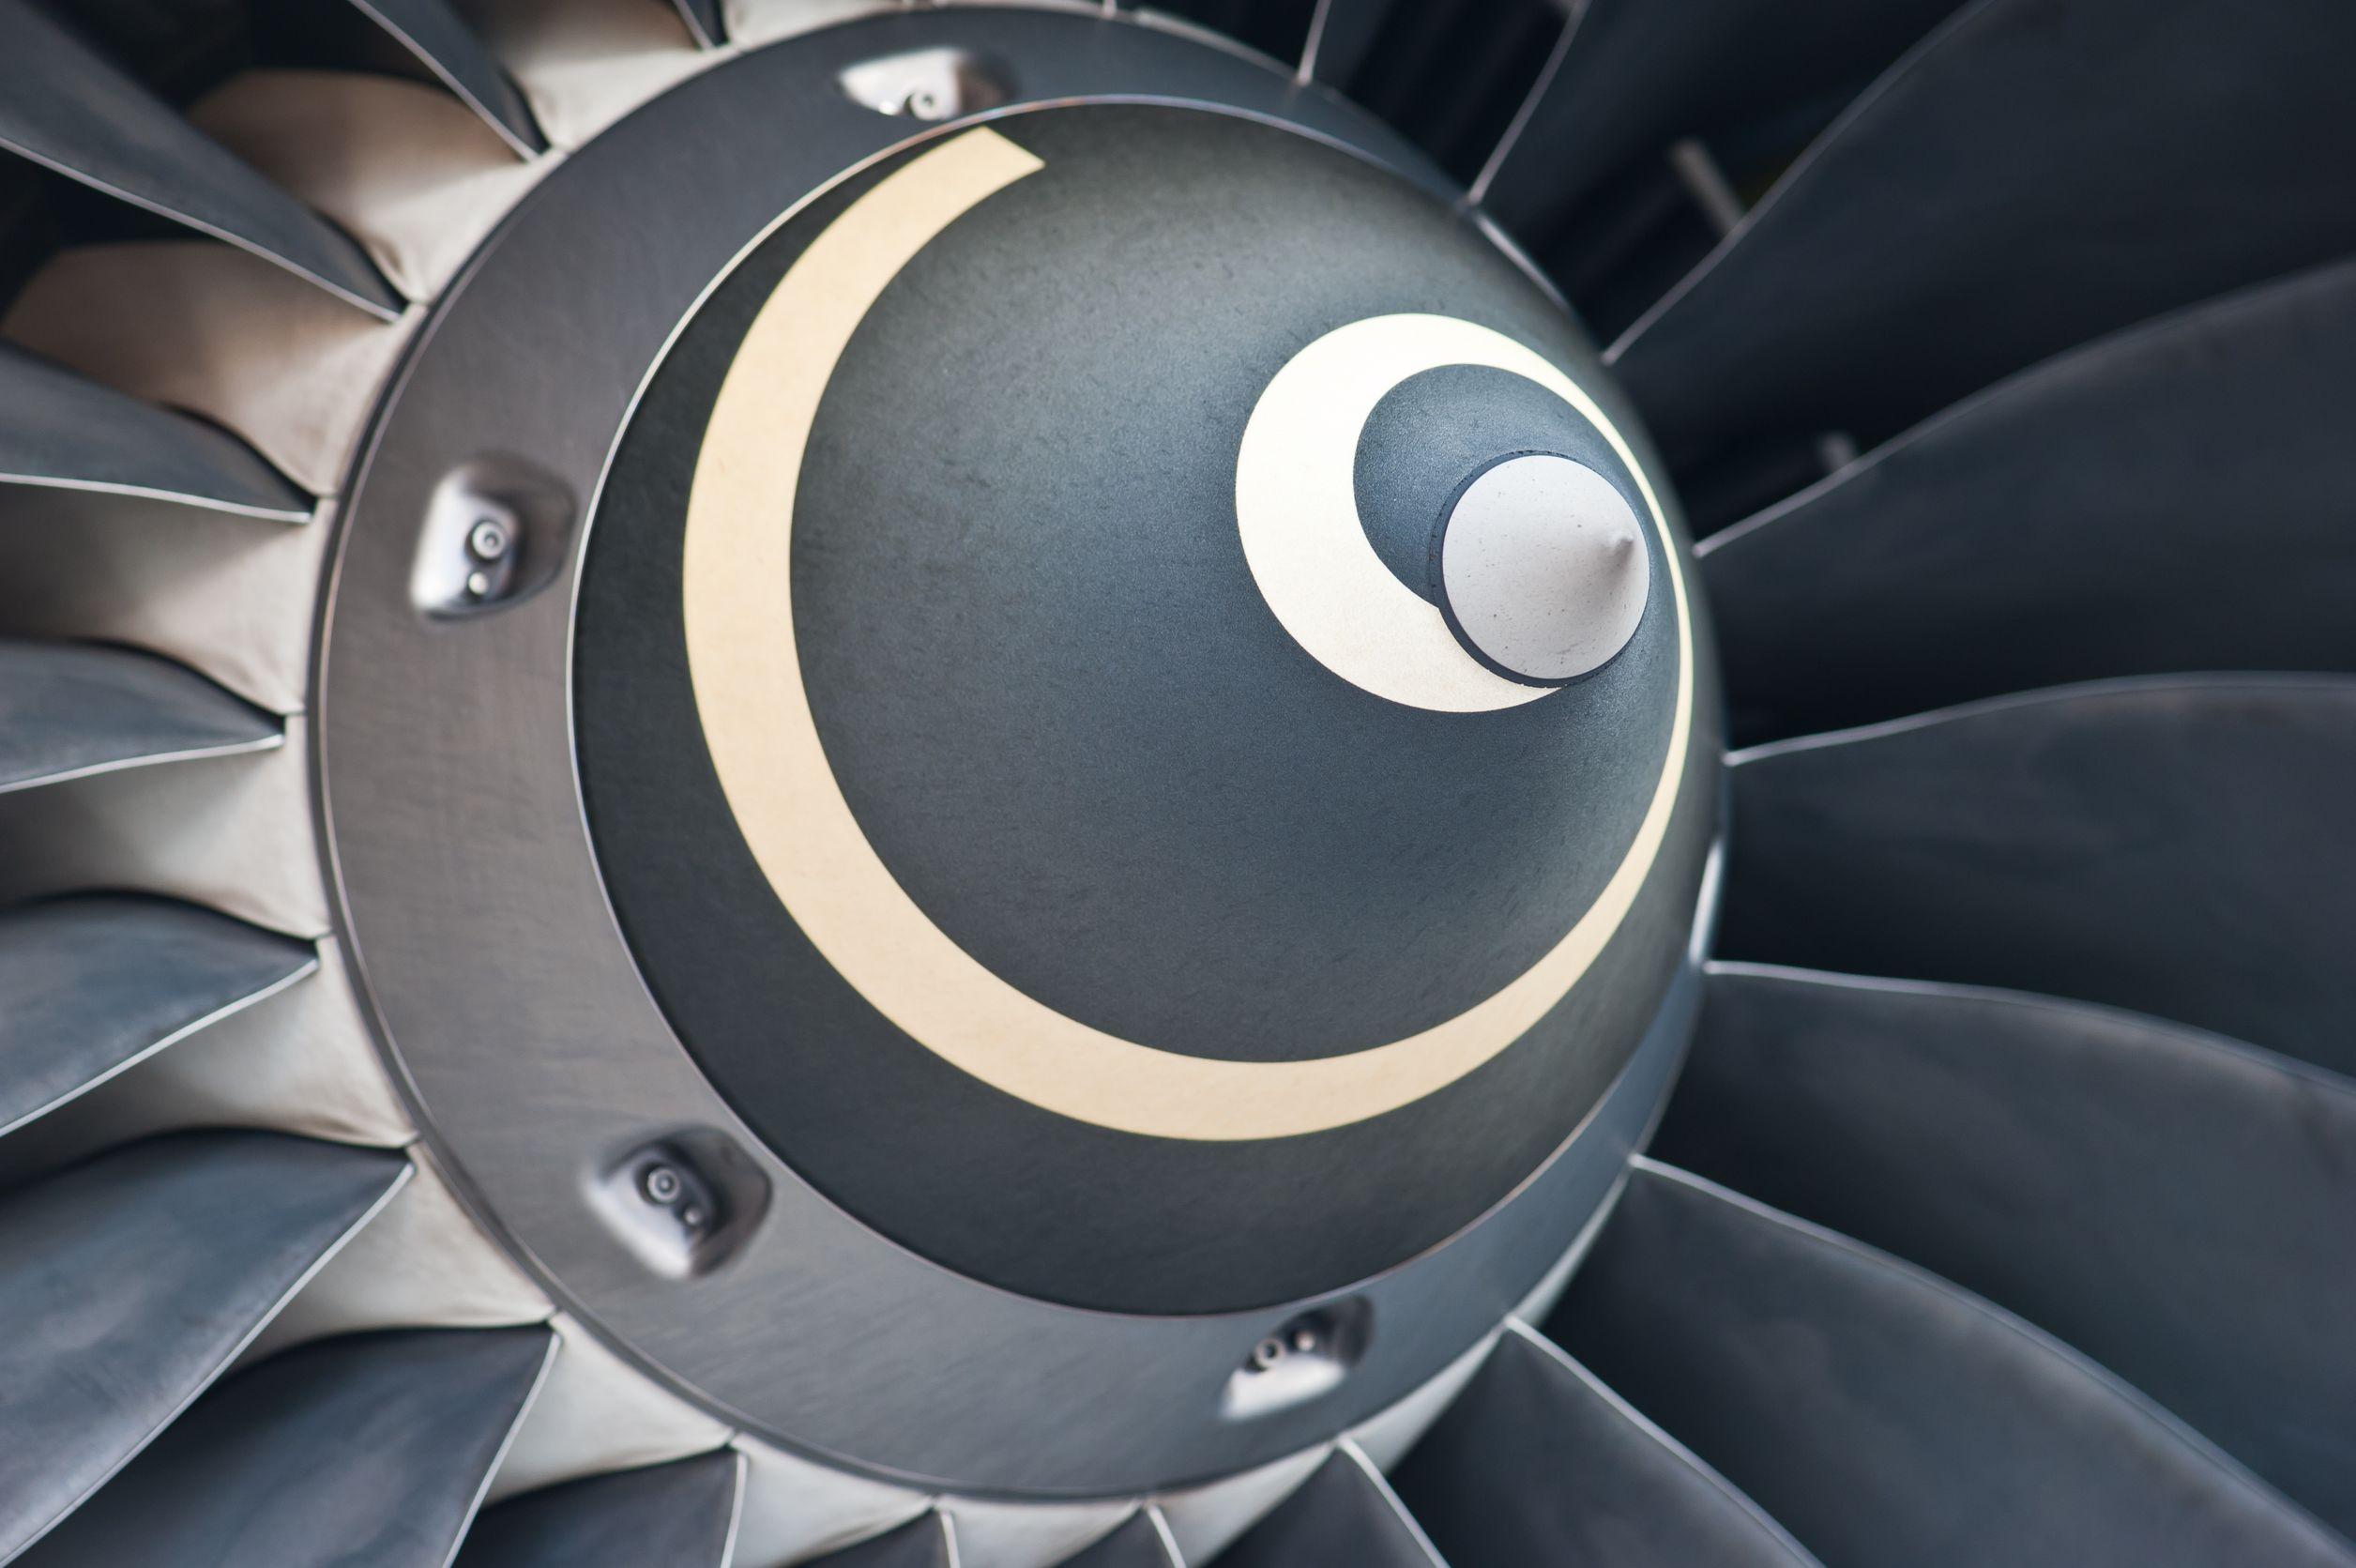 10972354 - turbine blades of an aircraft jet engine